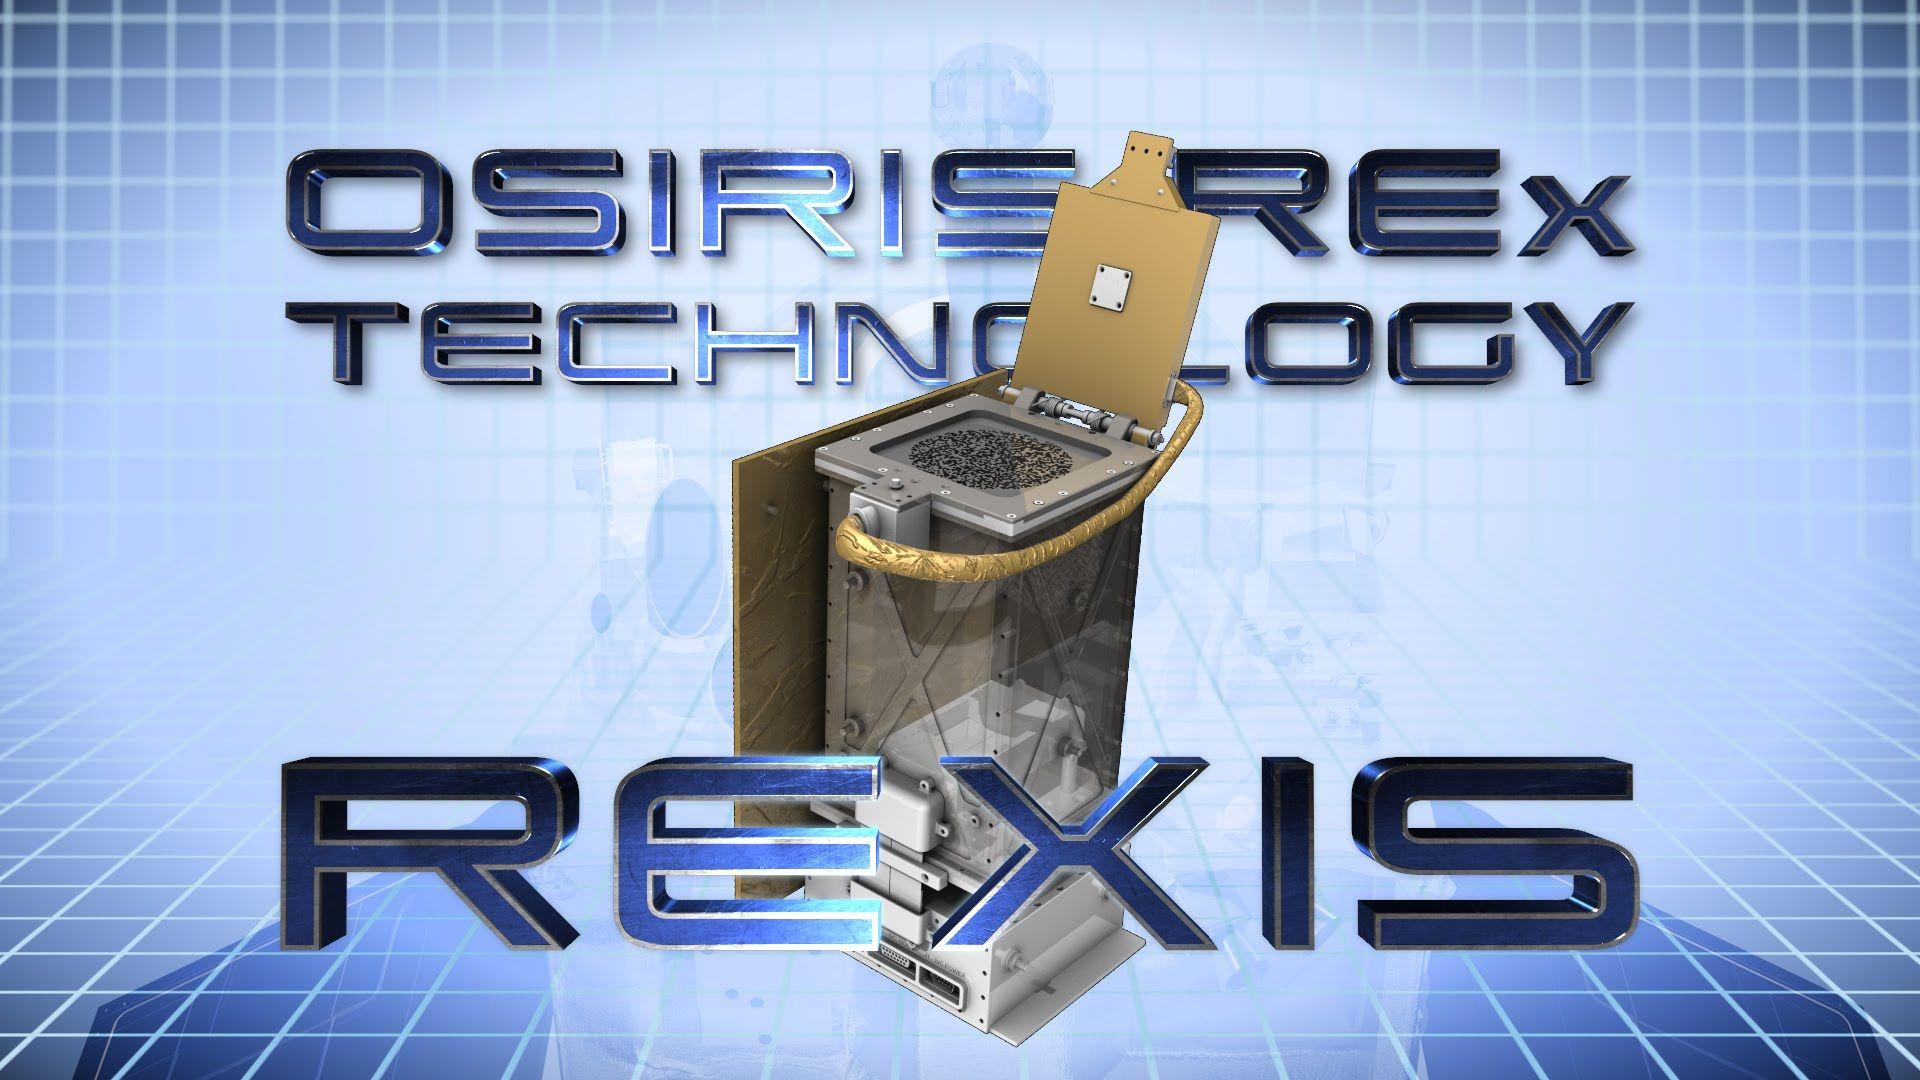 OSIRIS-REx Tech - Surveying an Asteroid with X-rays